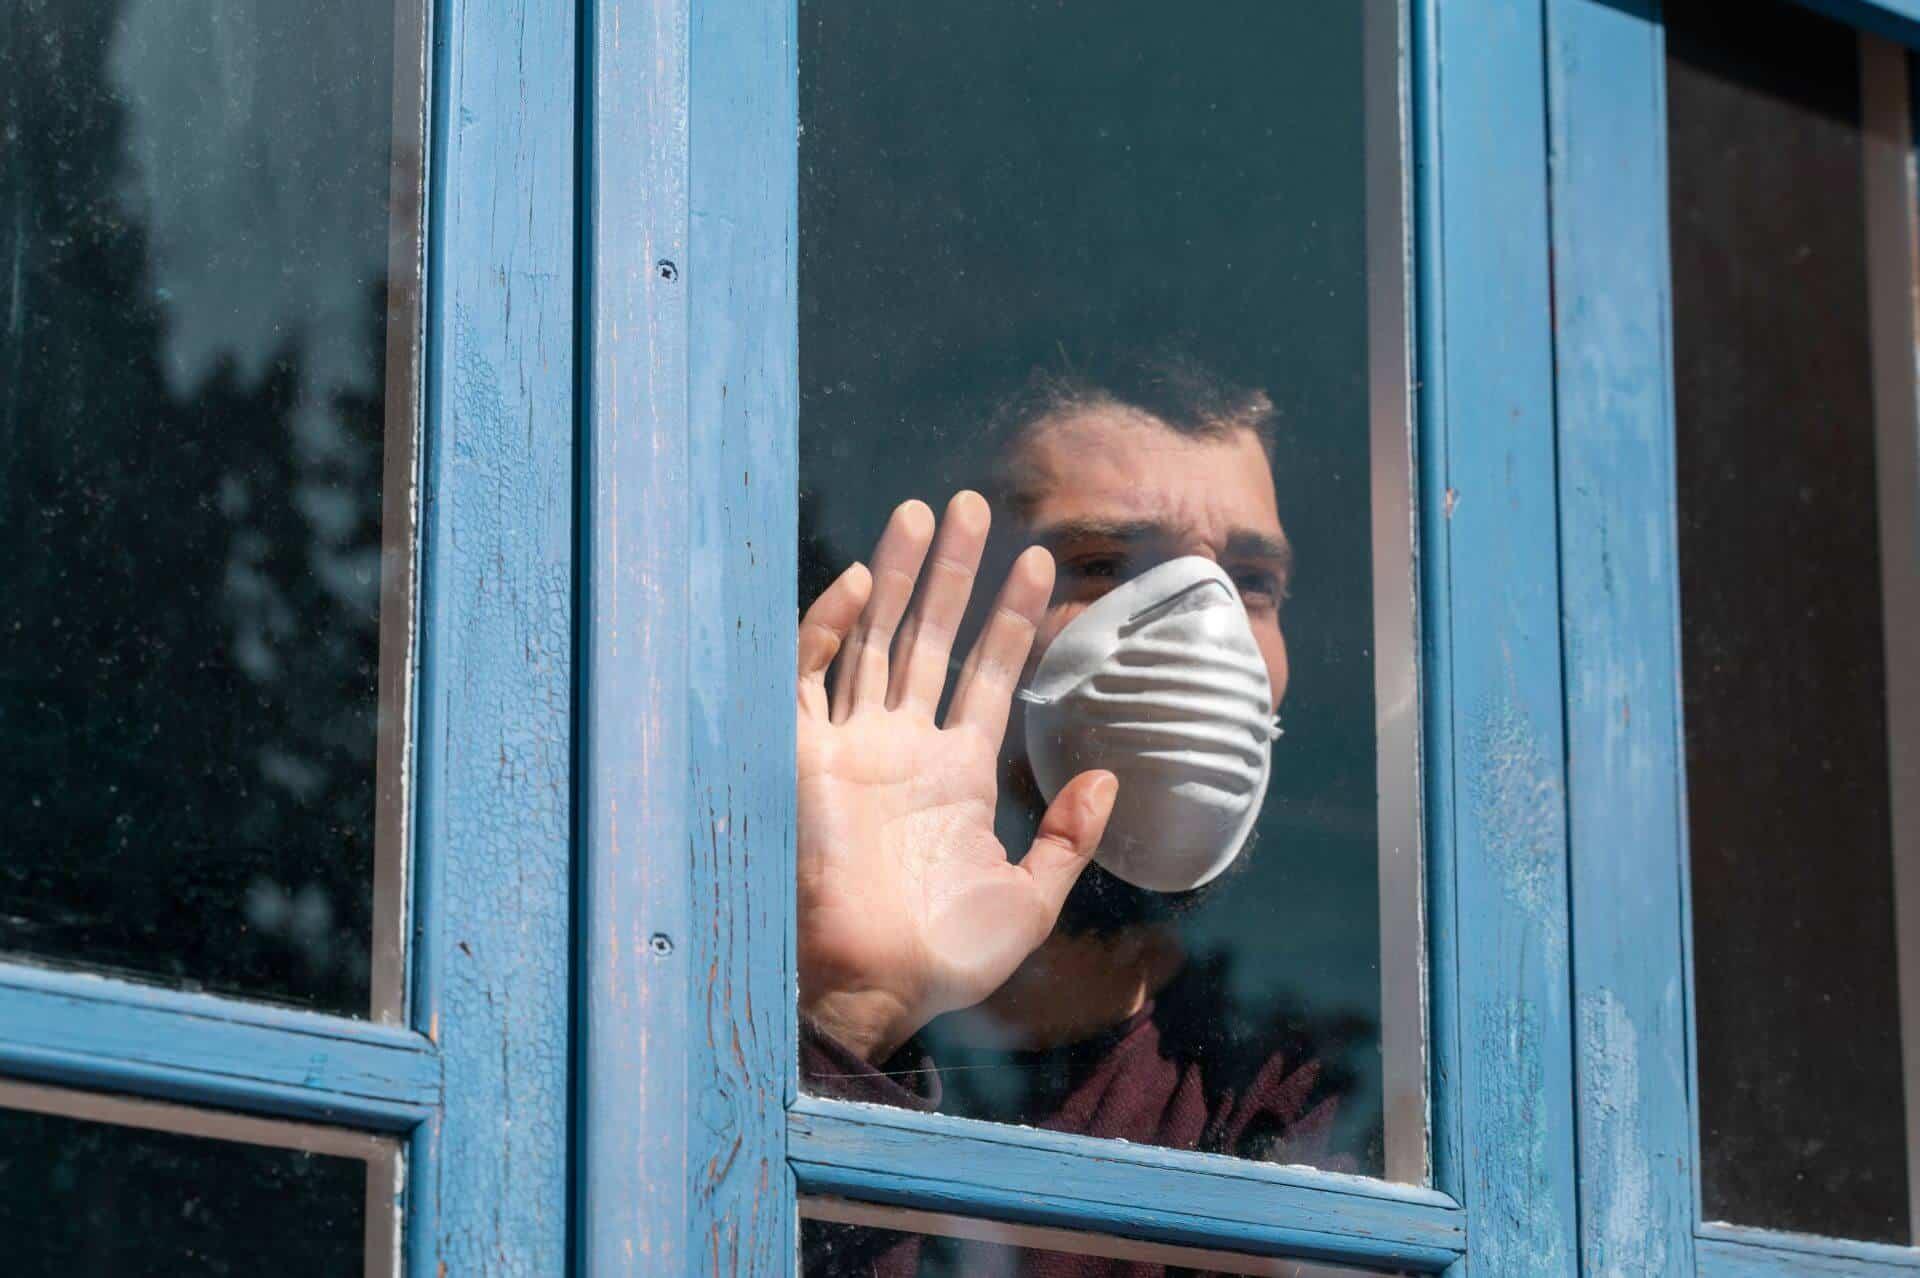 Man sick during Corona Covid19 Pandemic. bconceptgroup.com